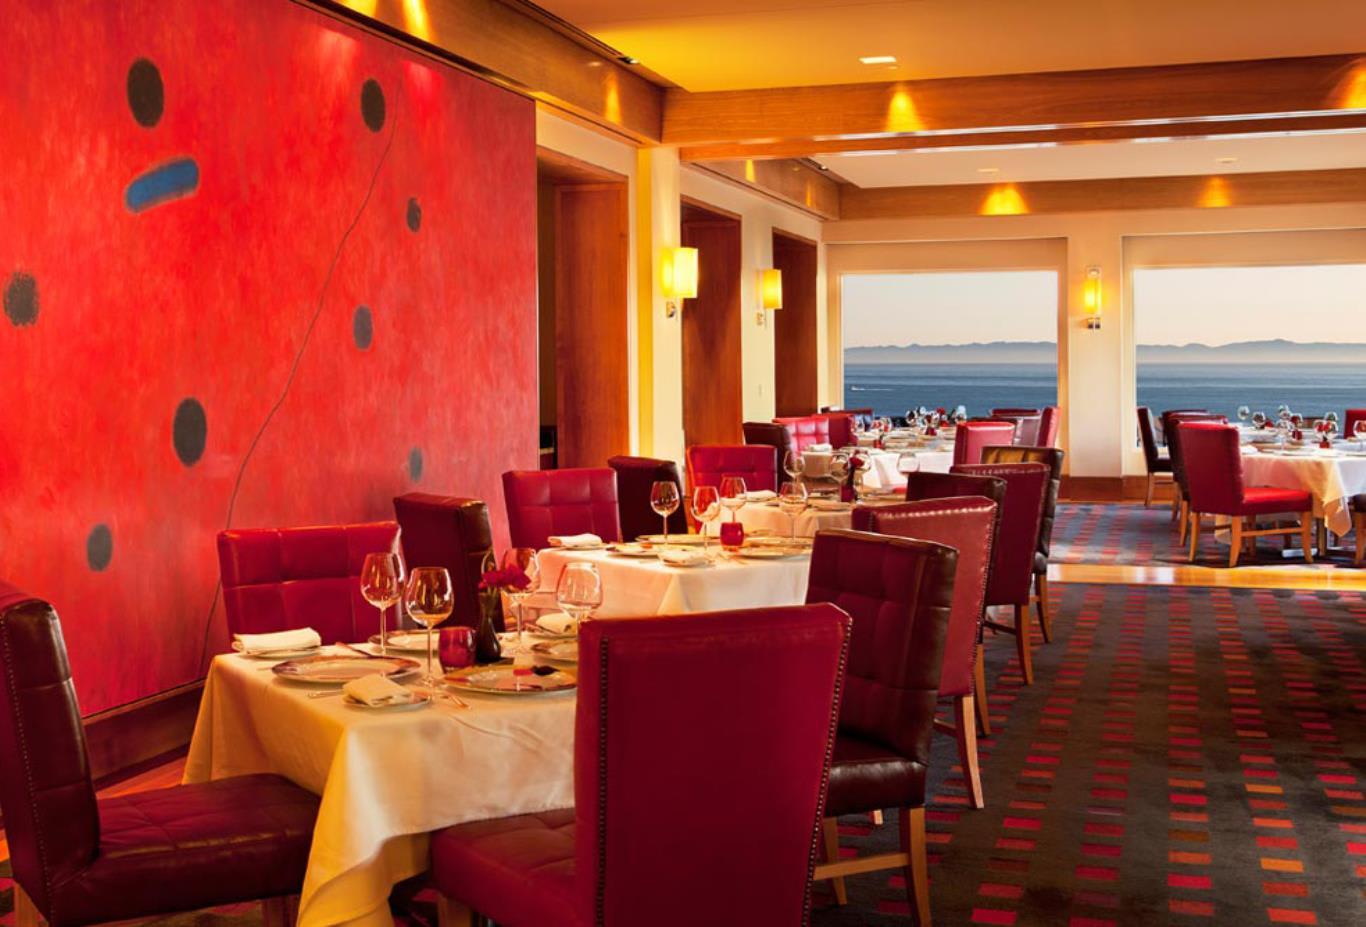 Miró Restaurant